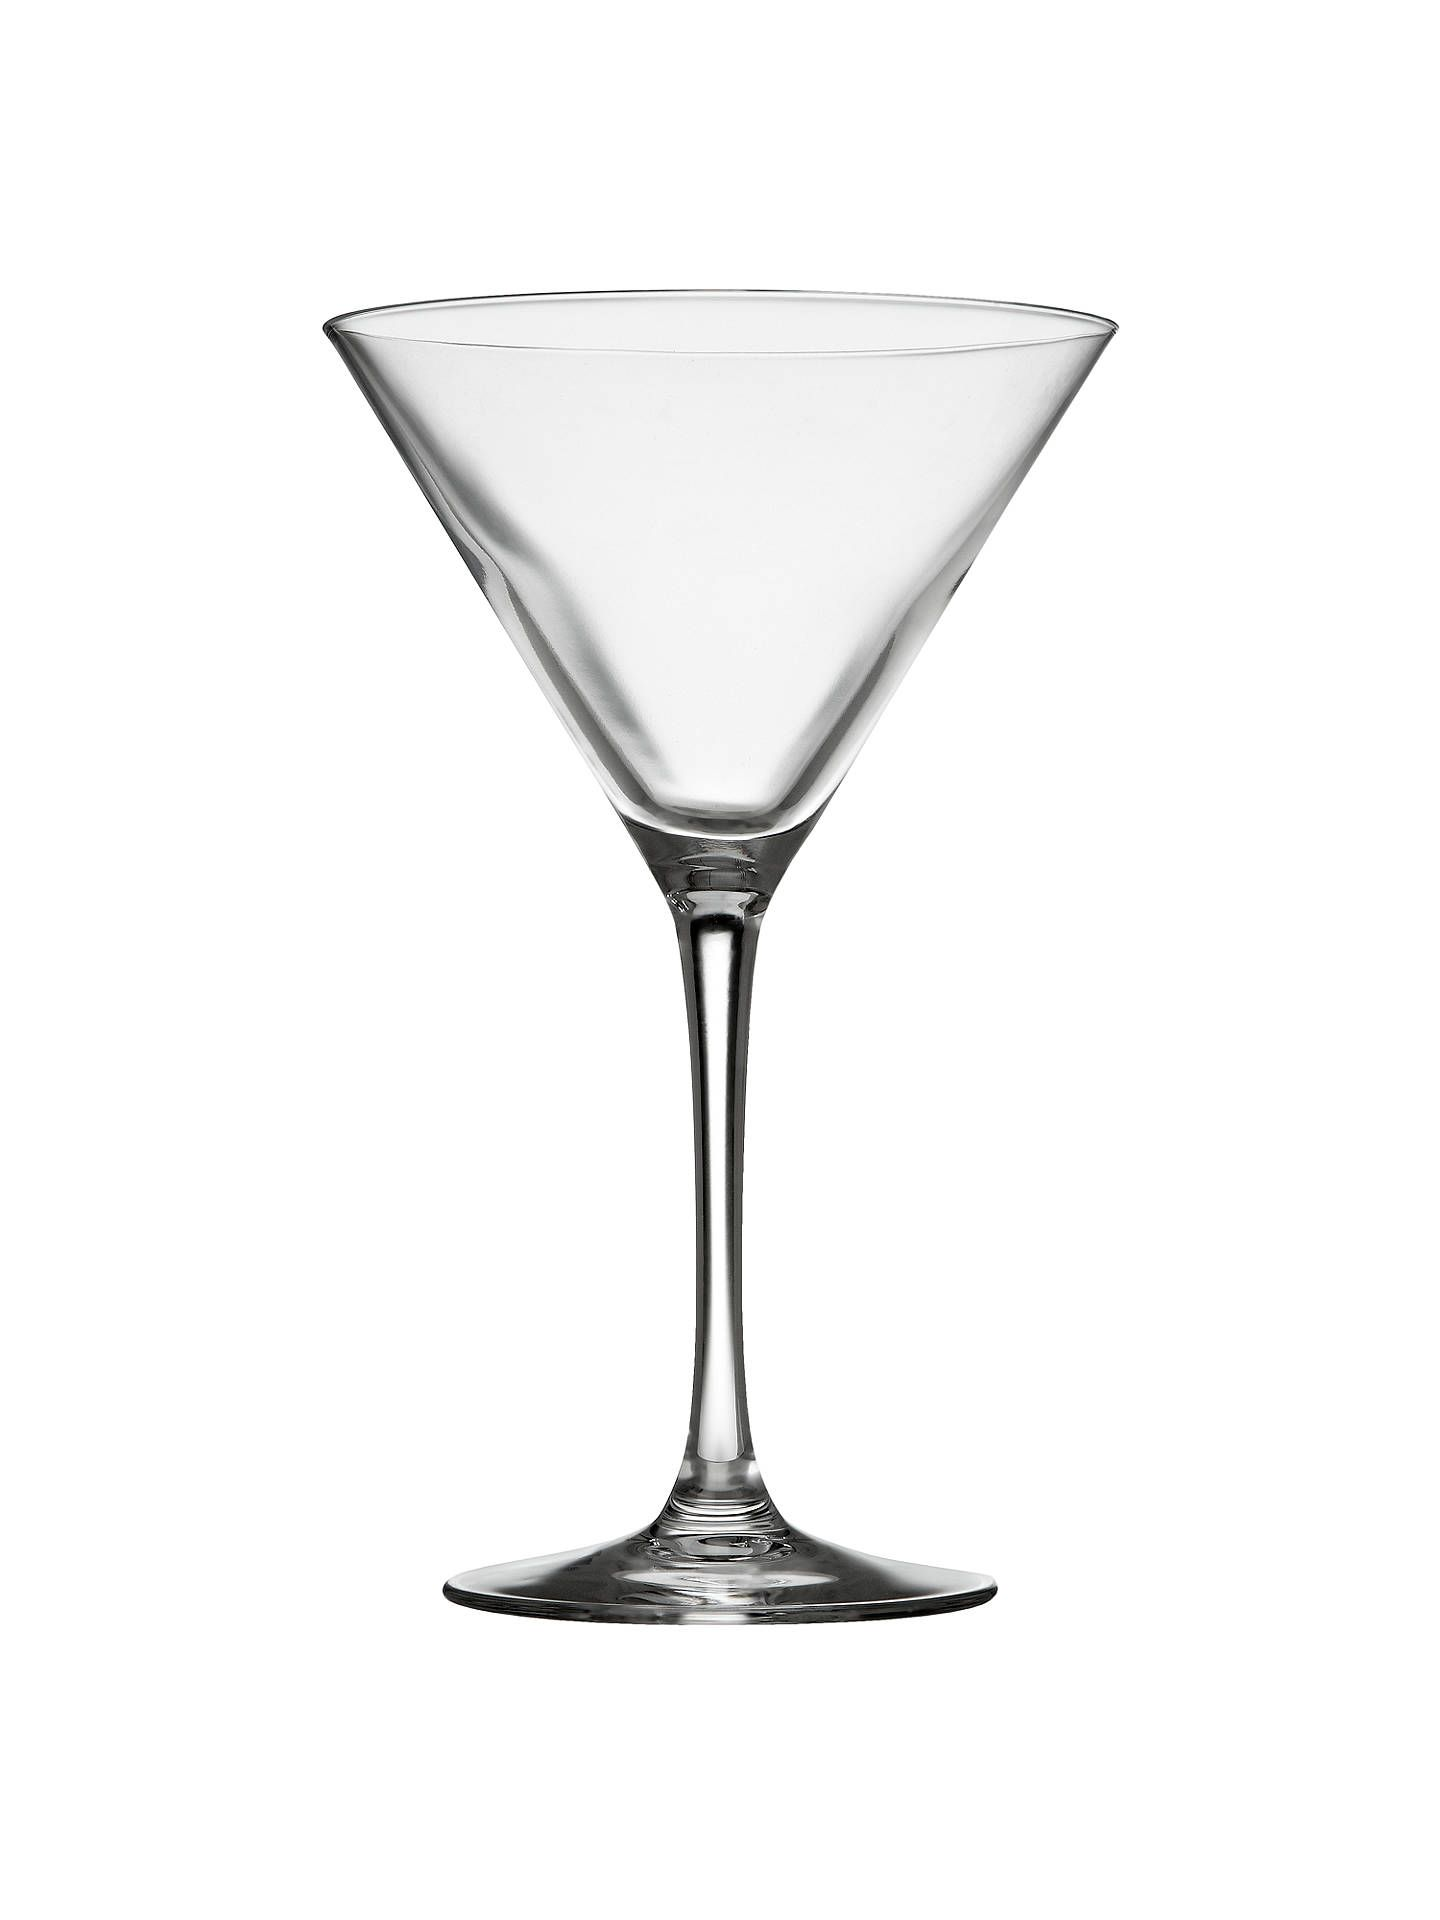 John Lewis & Partners Cocktail Cosmopolitan Glasses, Set